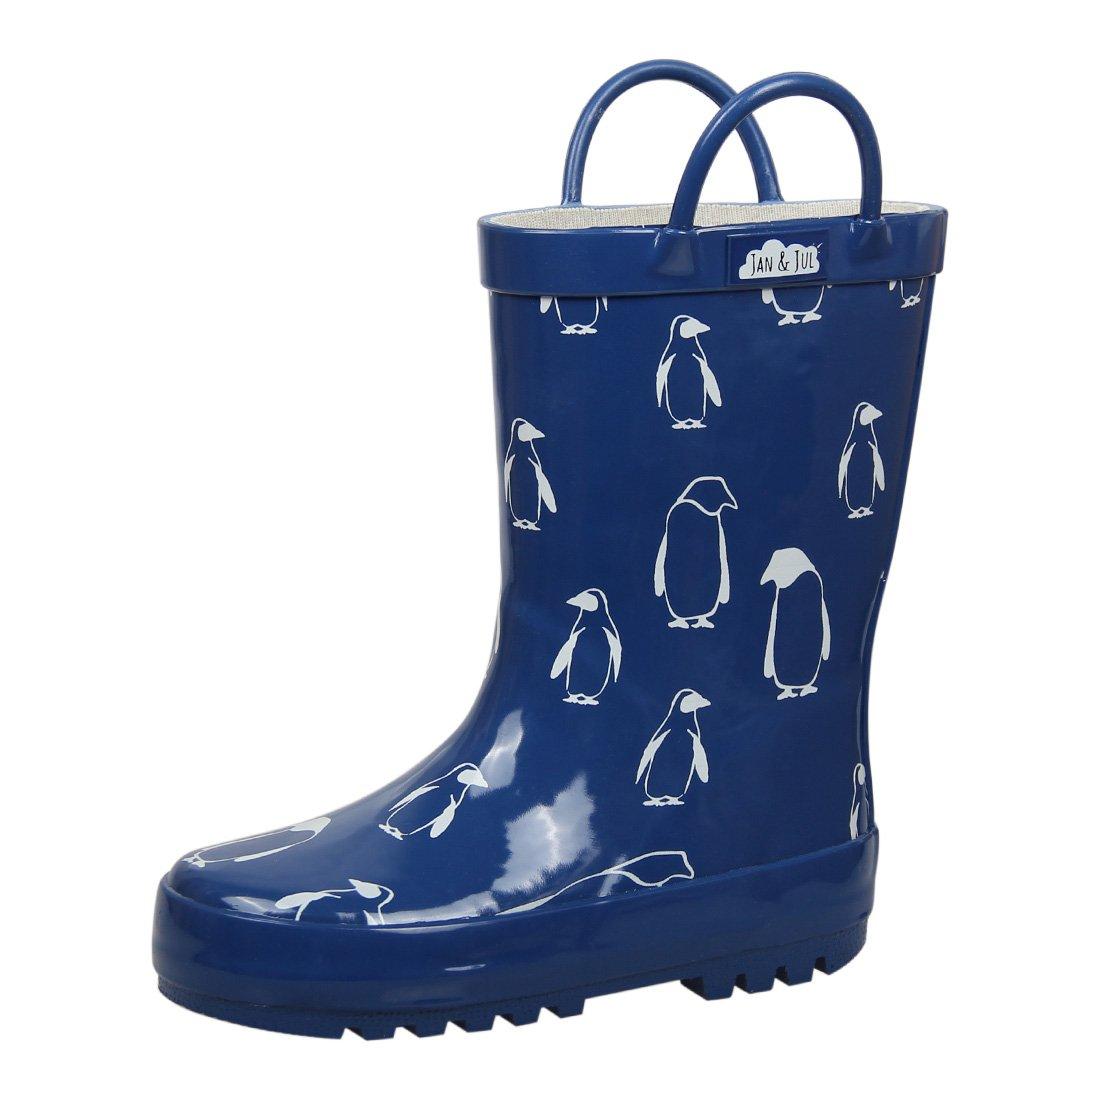 Jan /& Jul Natural Rubber Rain Boots Toddler Boys Girls Kids